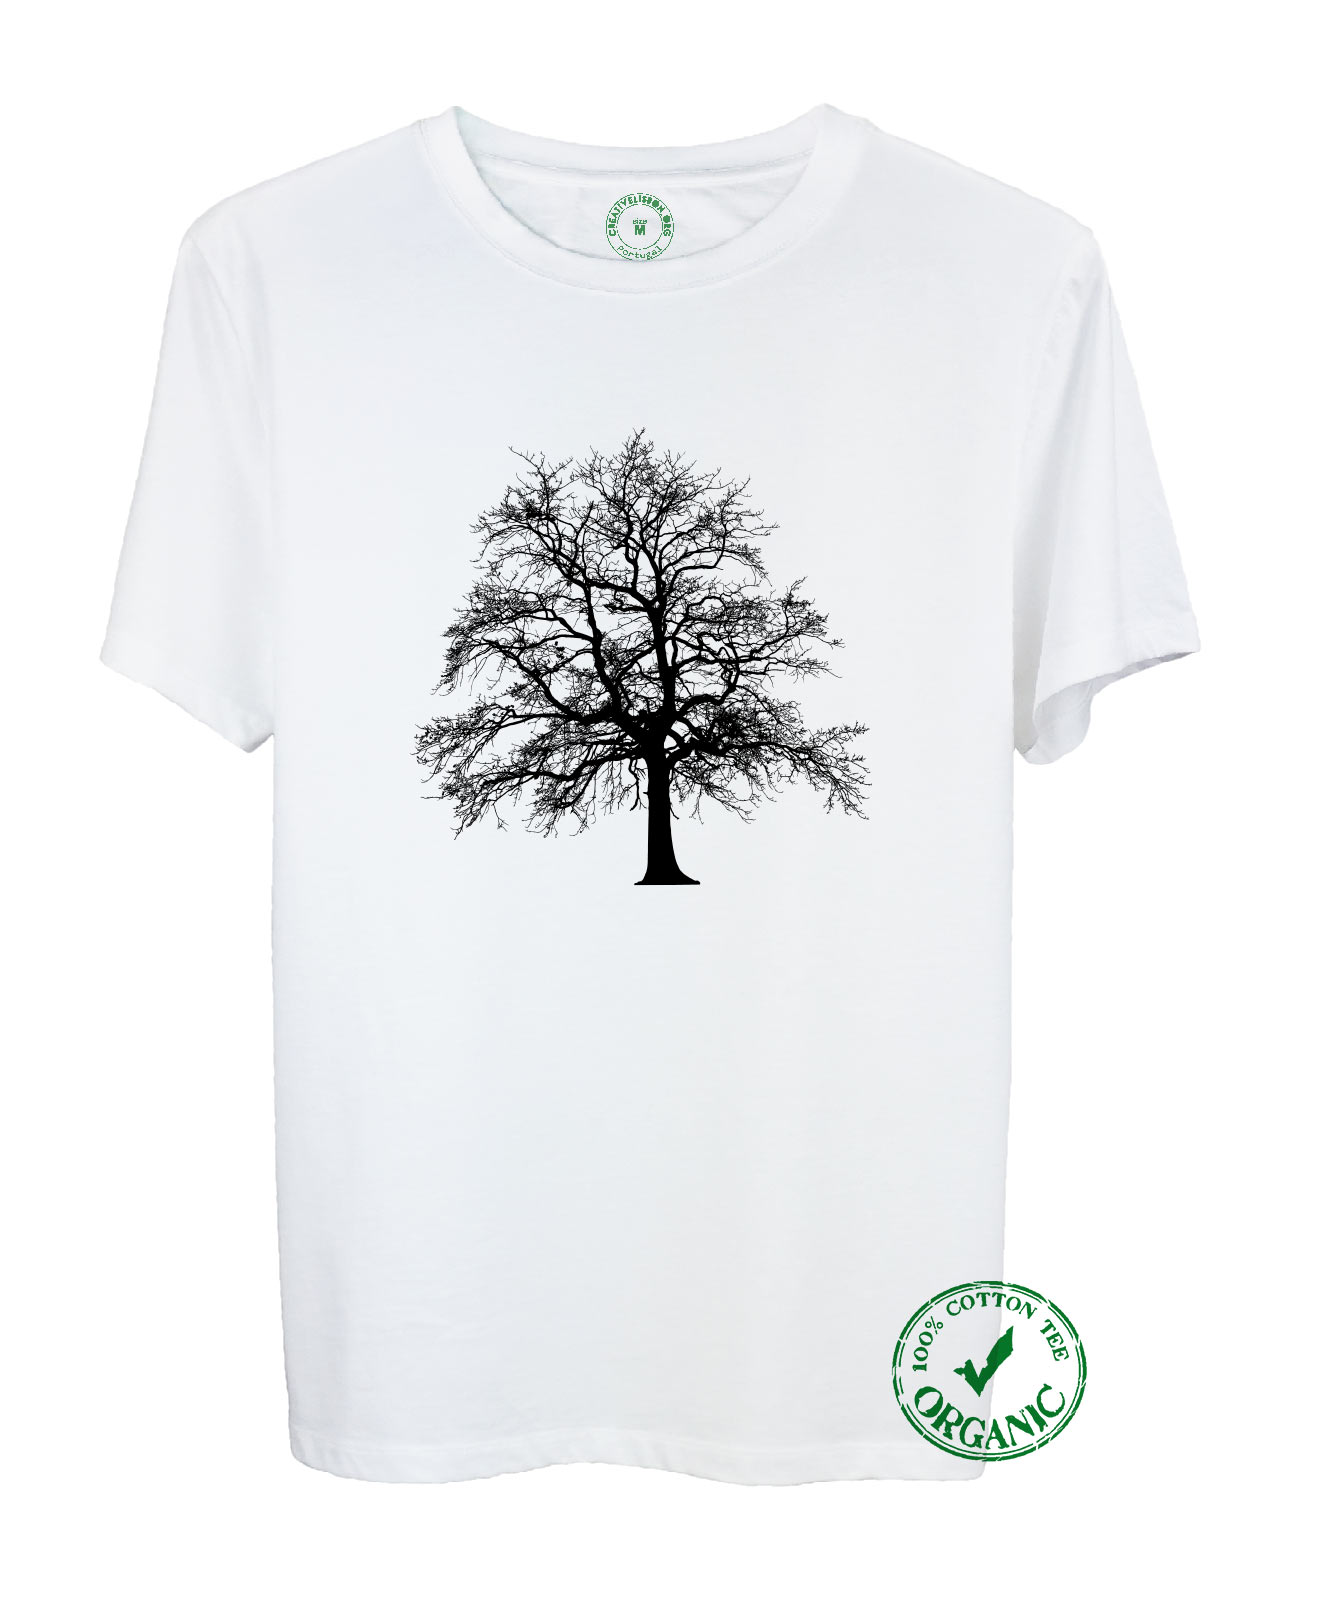 Naked Tree Organic T-shirt